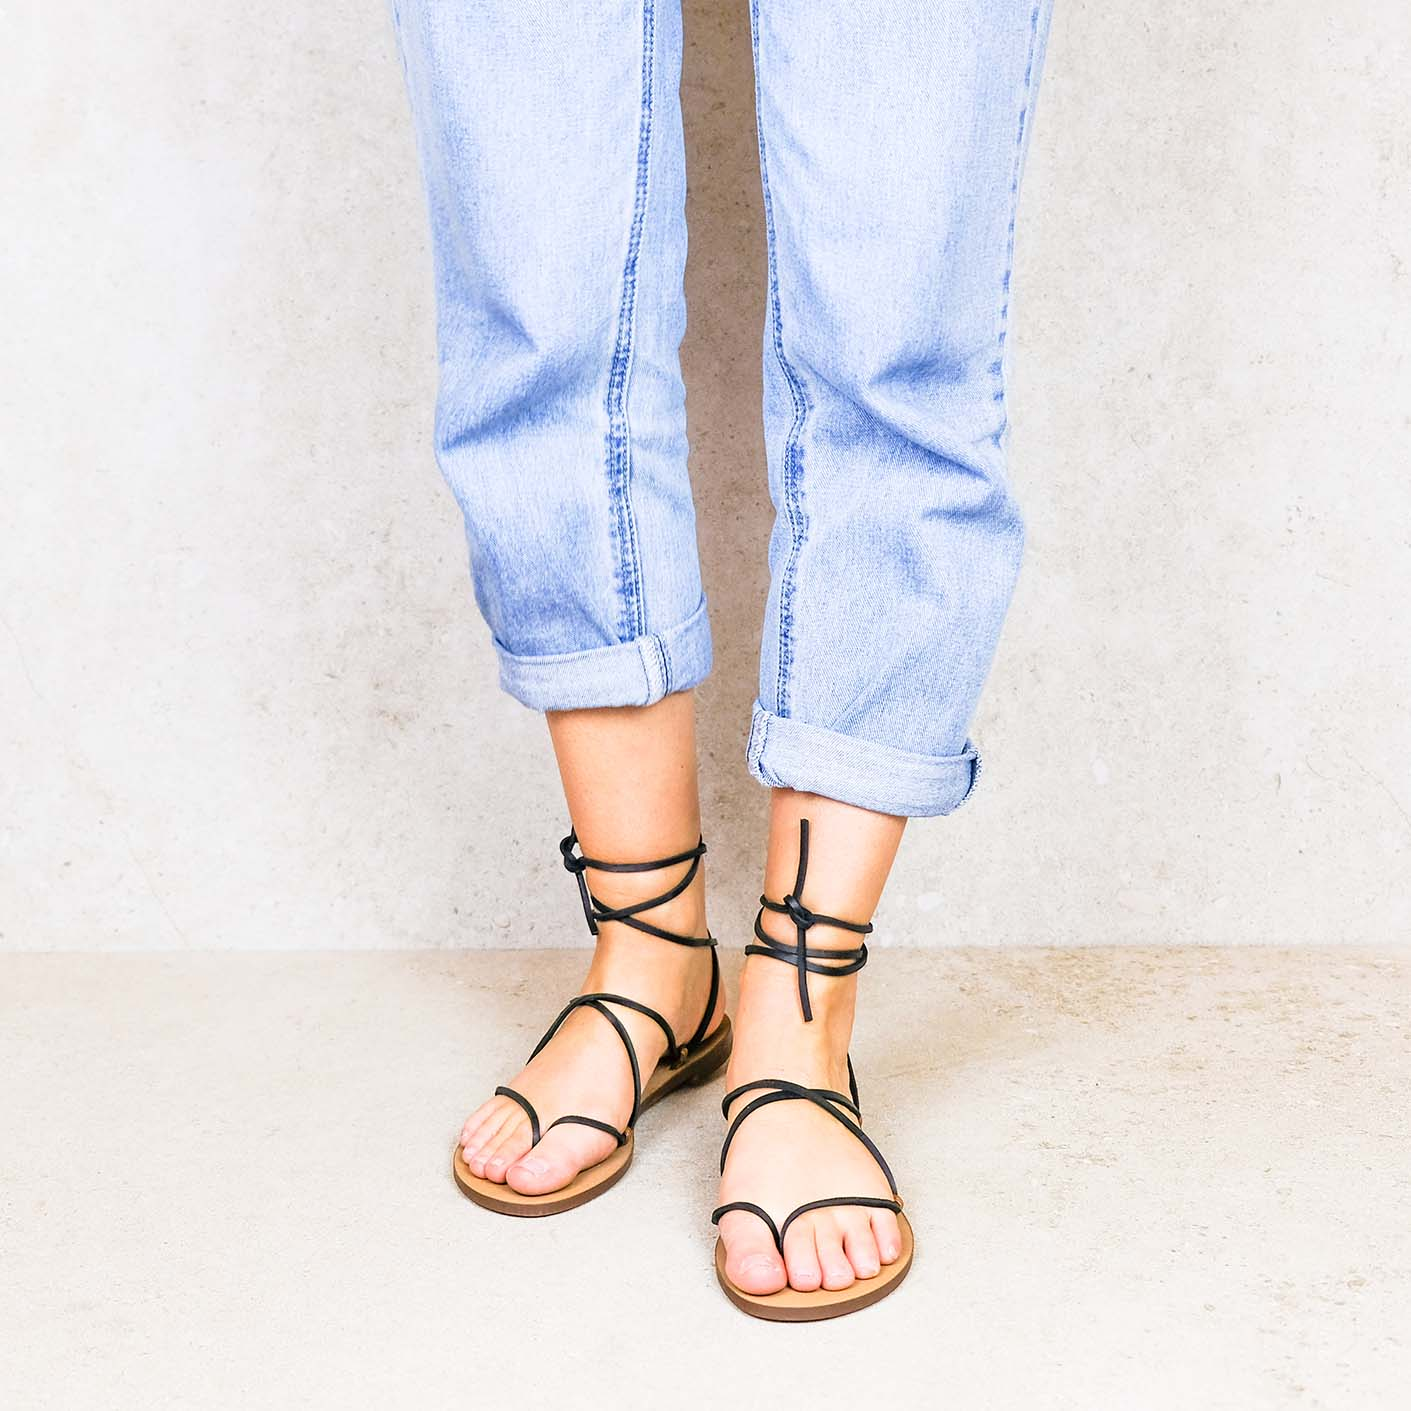 Coal-leather ribbons linten lintsandalen sandals travelsandals vegan sustainable sandals wikkelsandalen